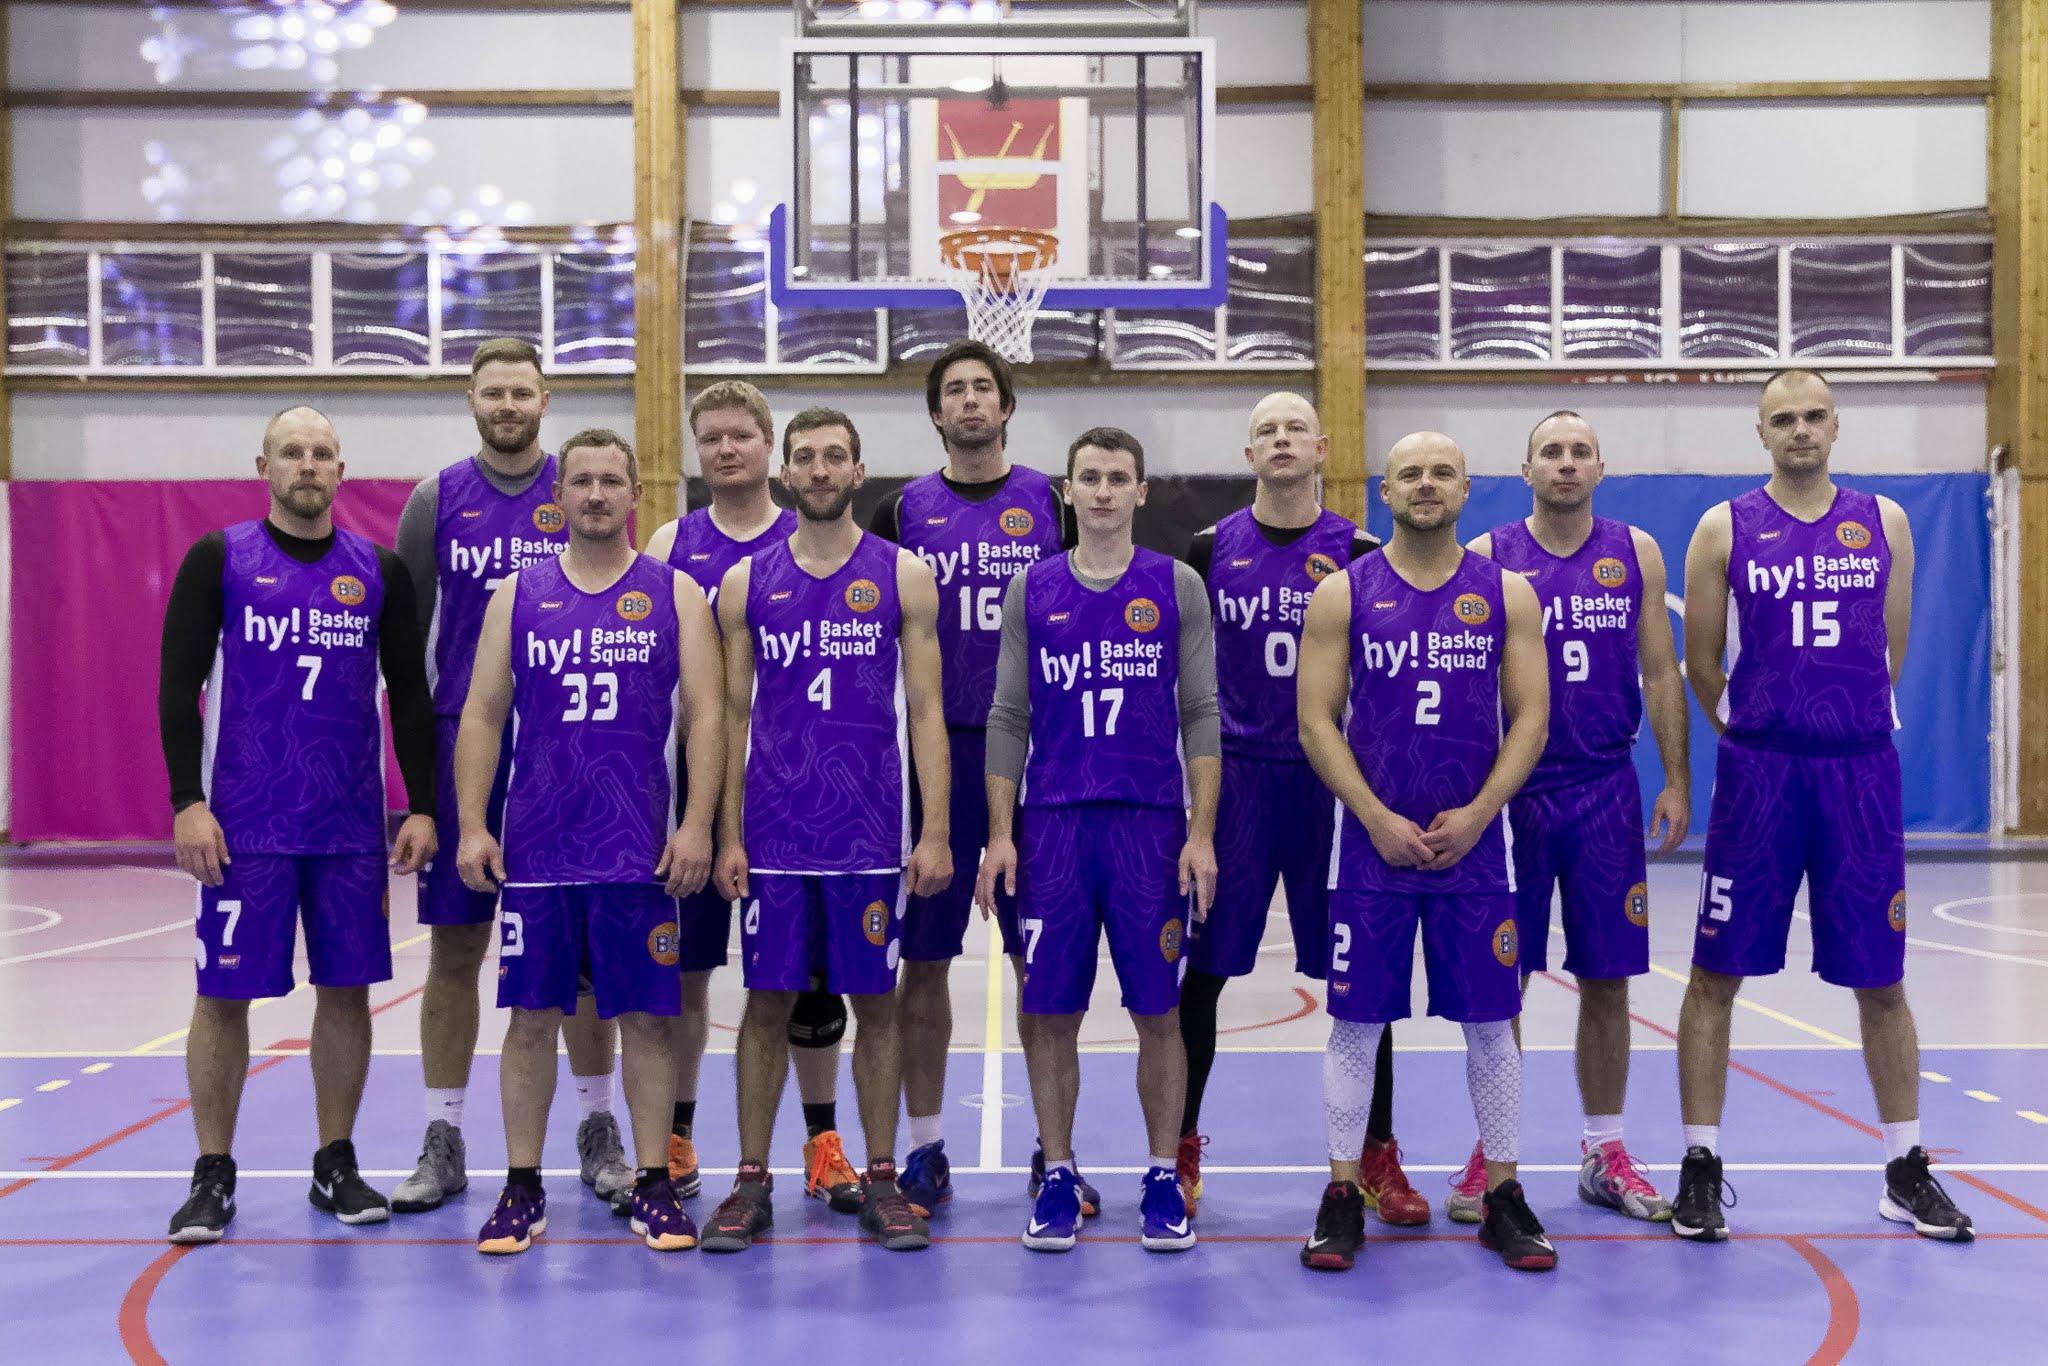 Hycom_Basket_Squad